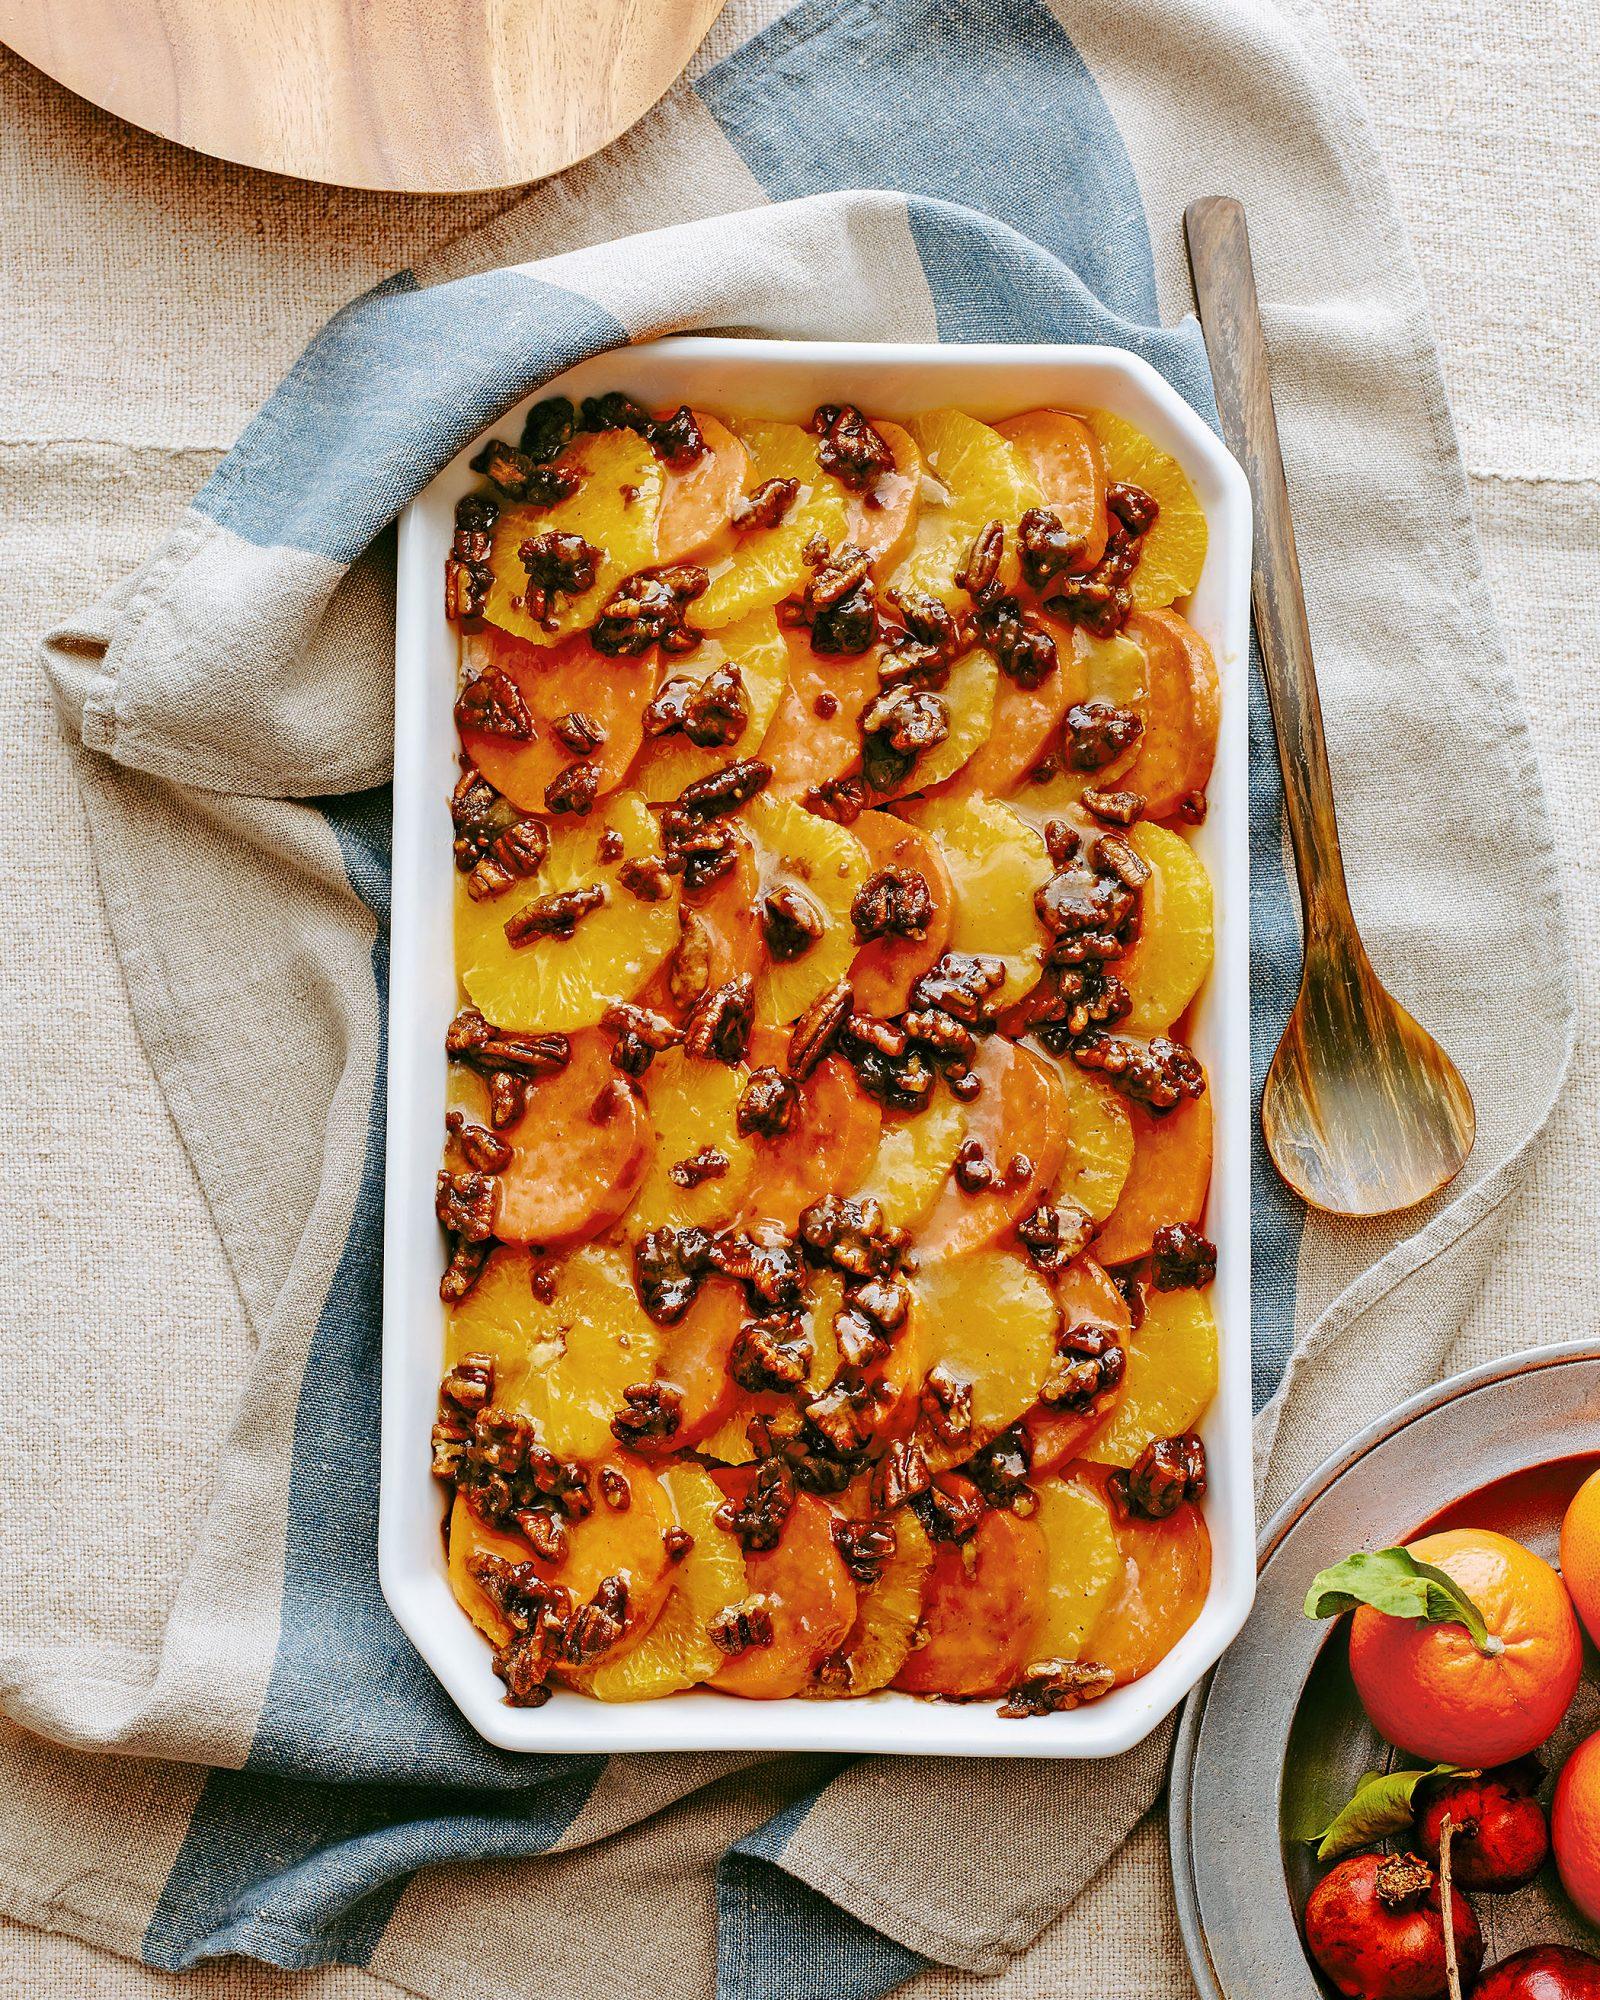 joy philbin's sweet potato orange casserole